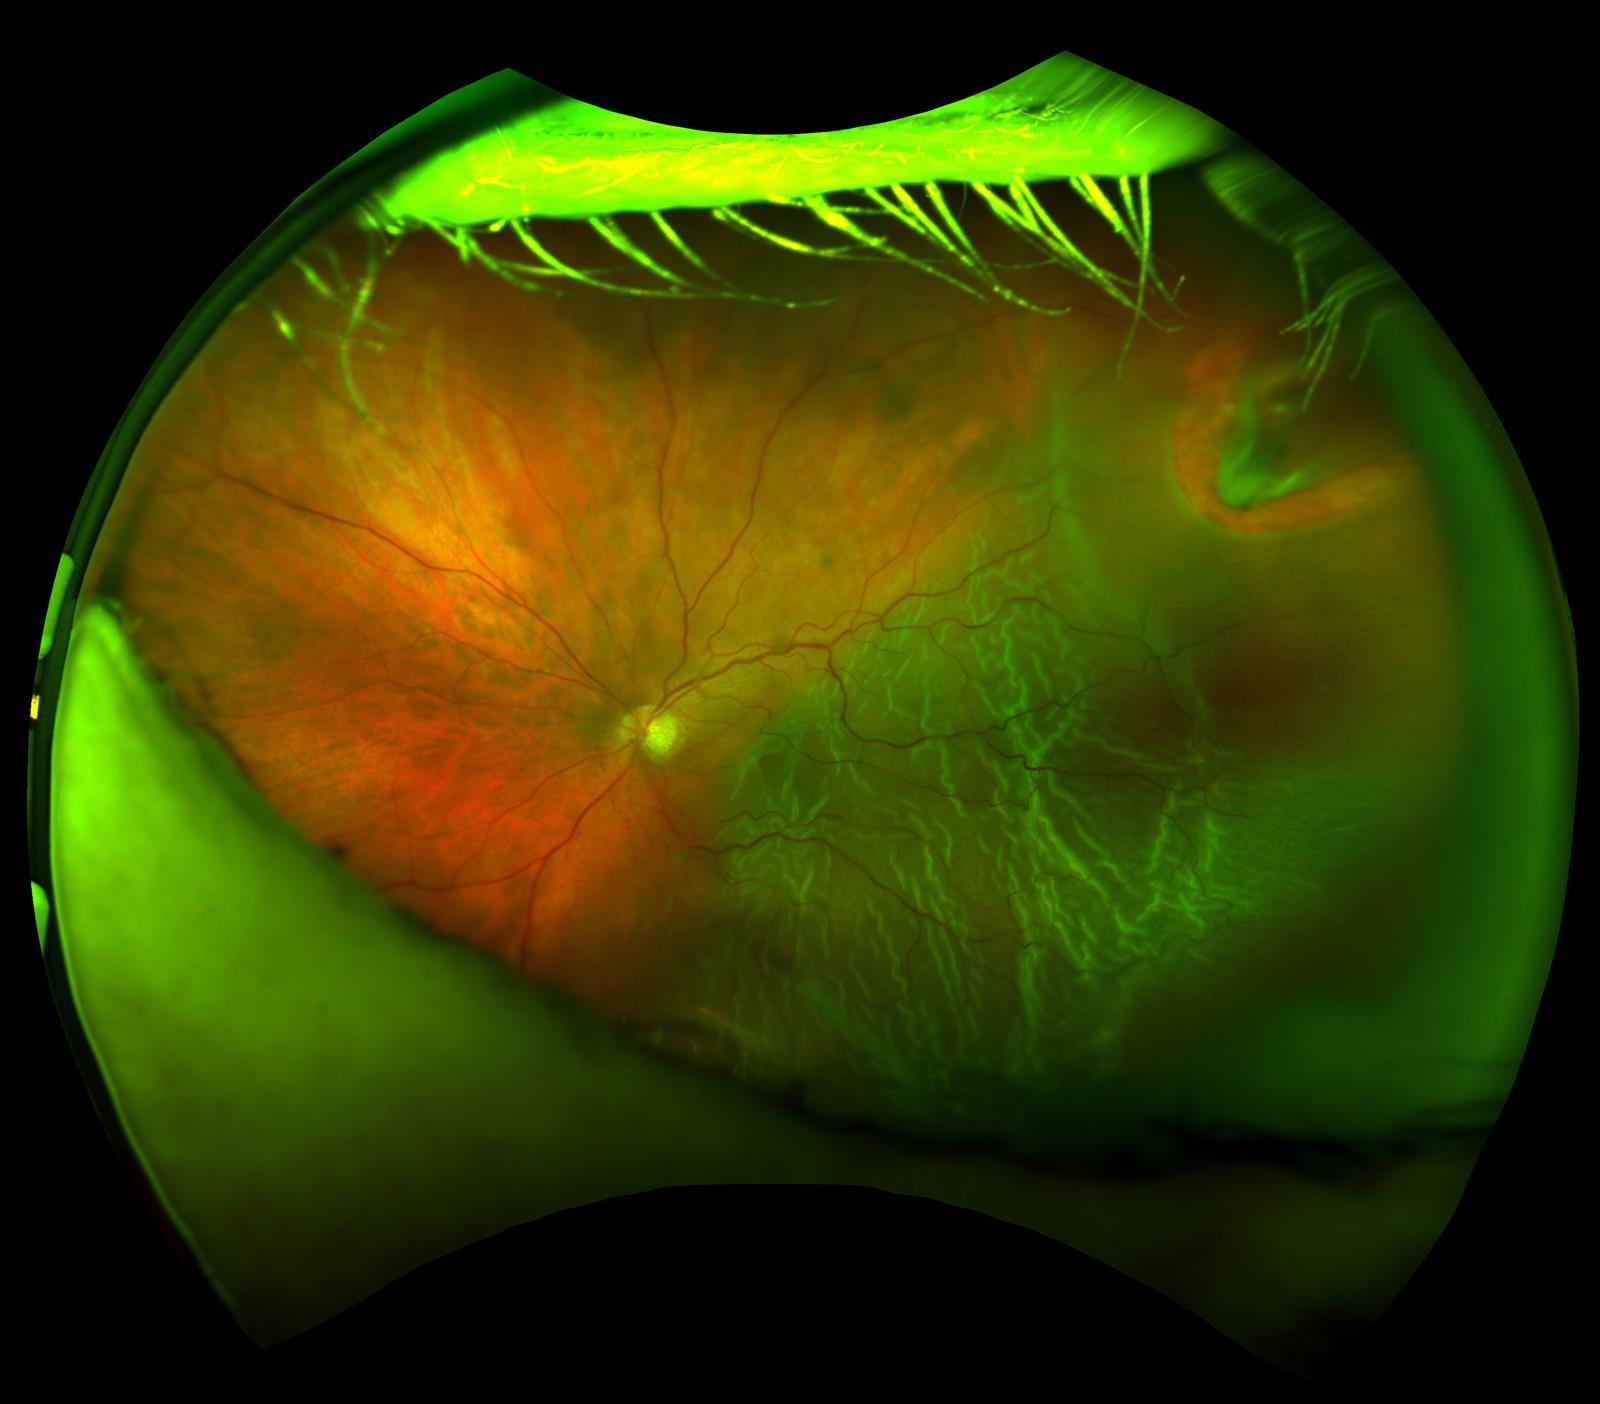 Large Horseshoe Retinal Tear and Detachment